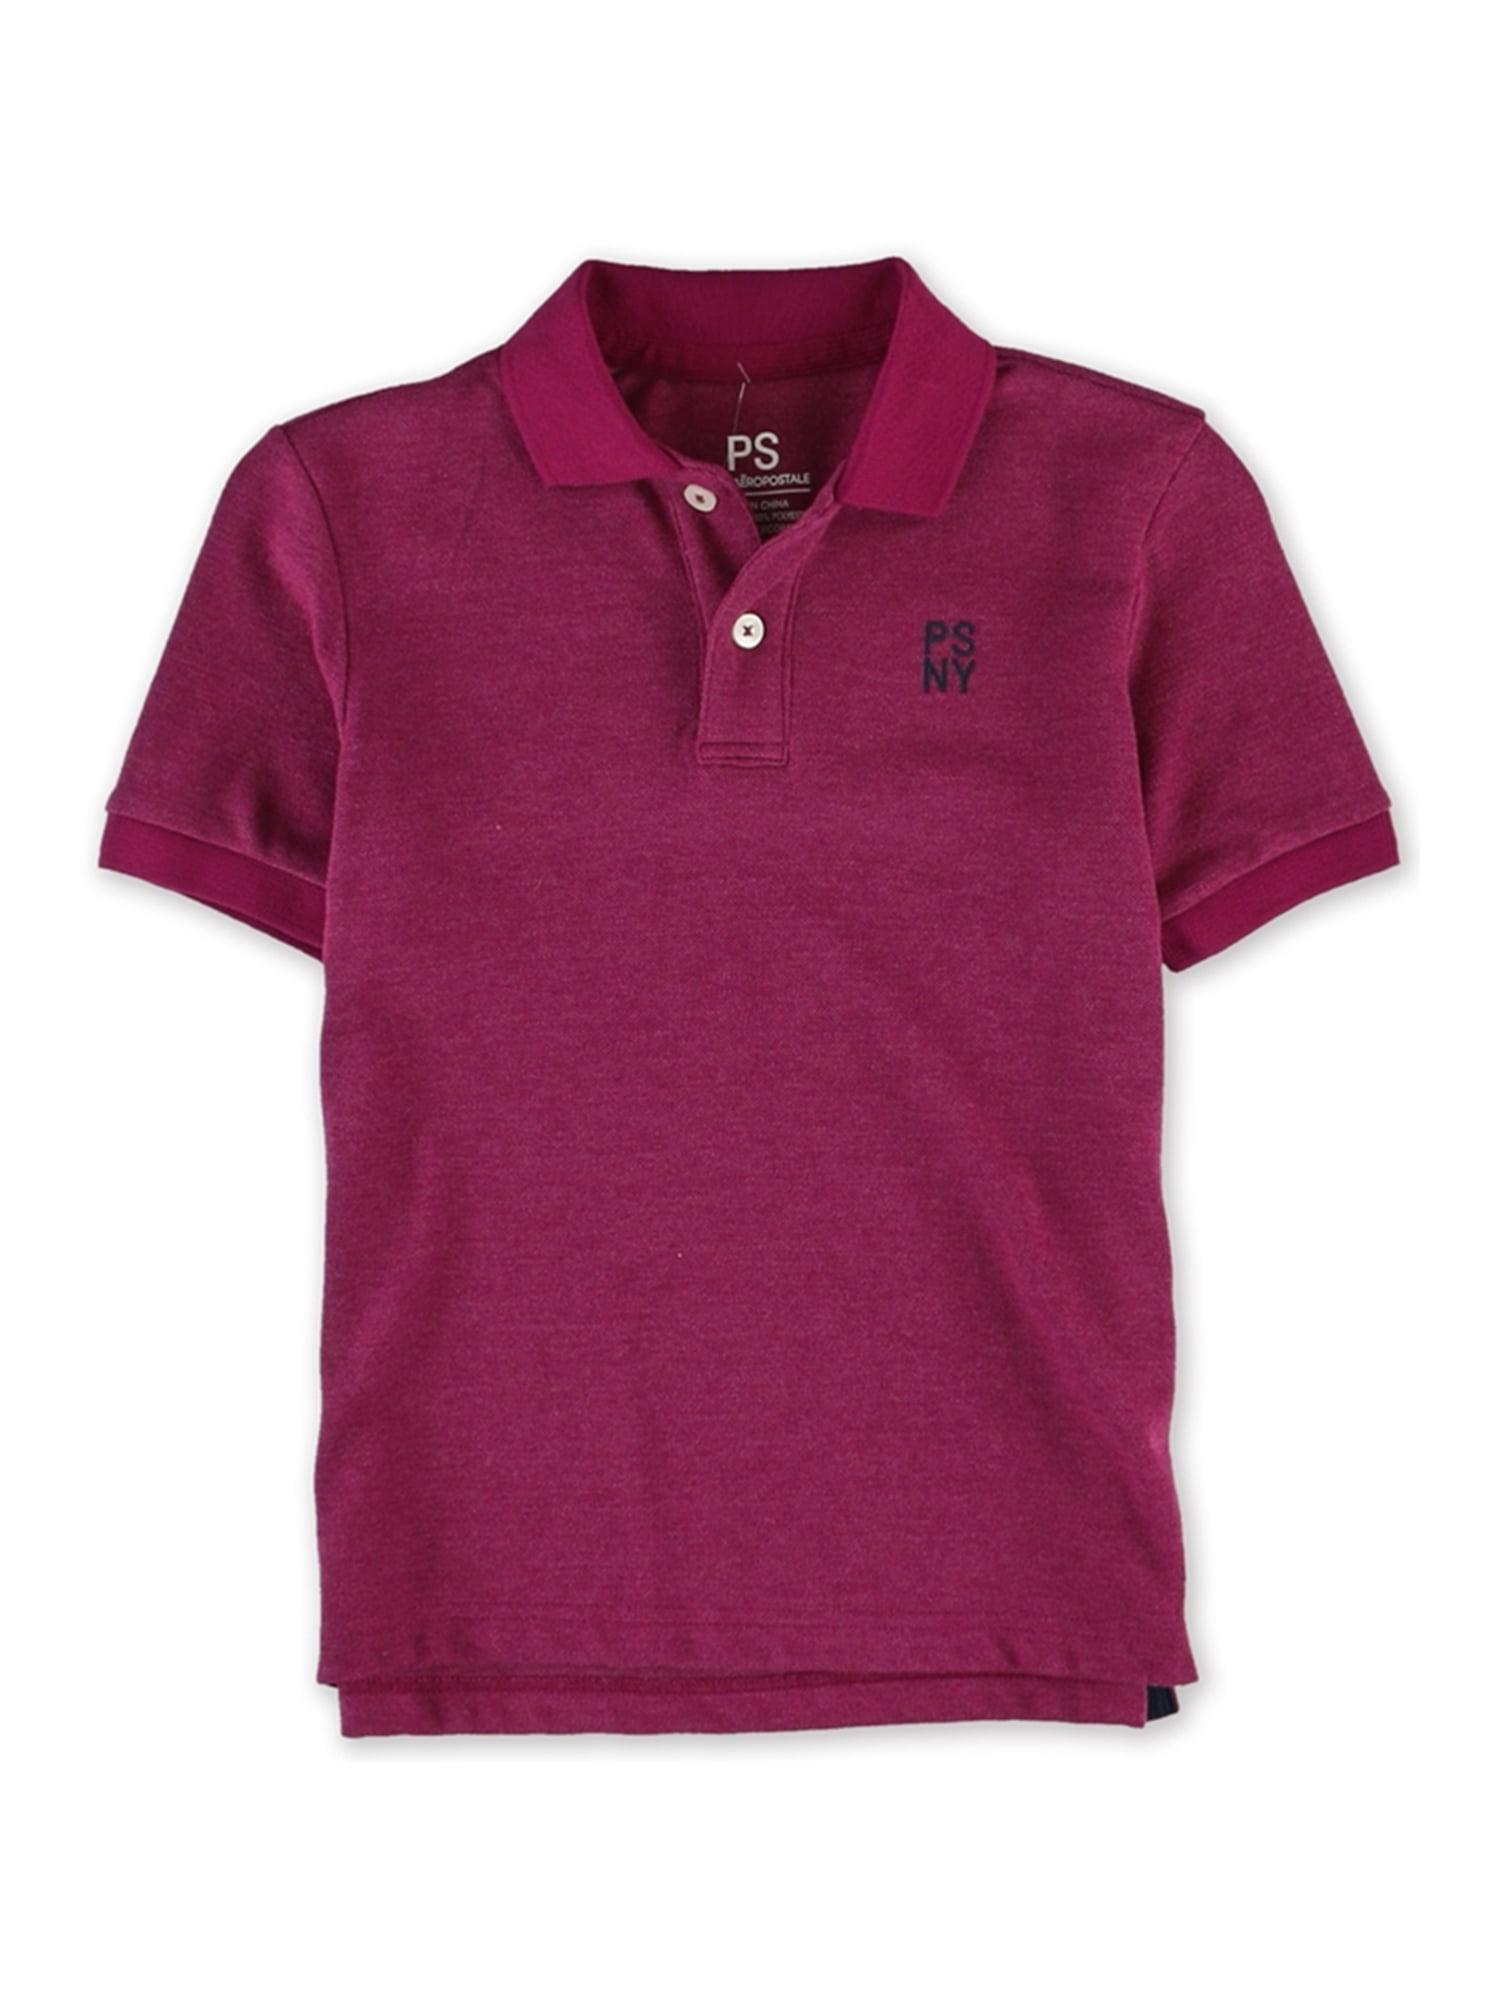 Aeropostale Boys Psny Rugby Polo Shirt